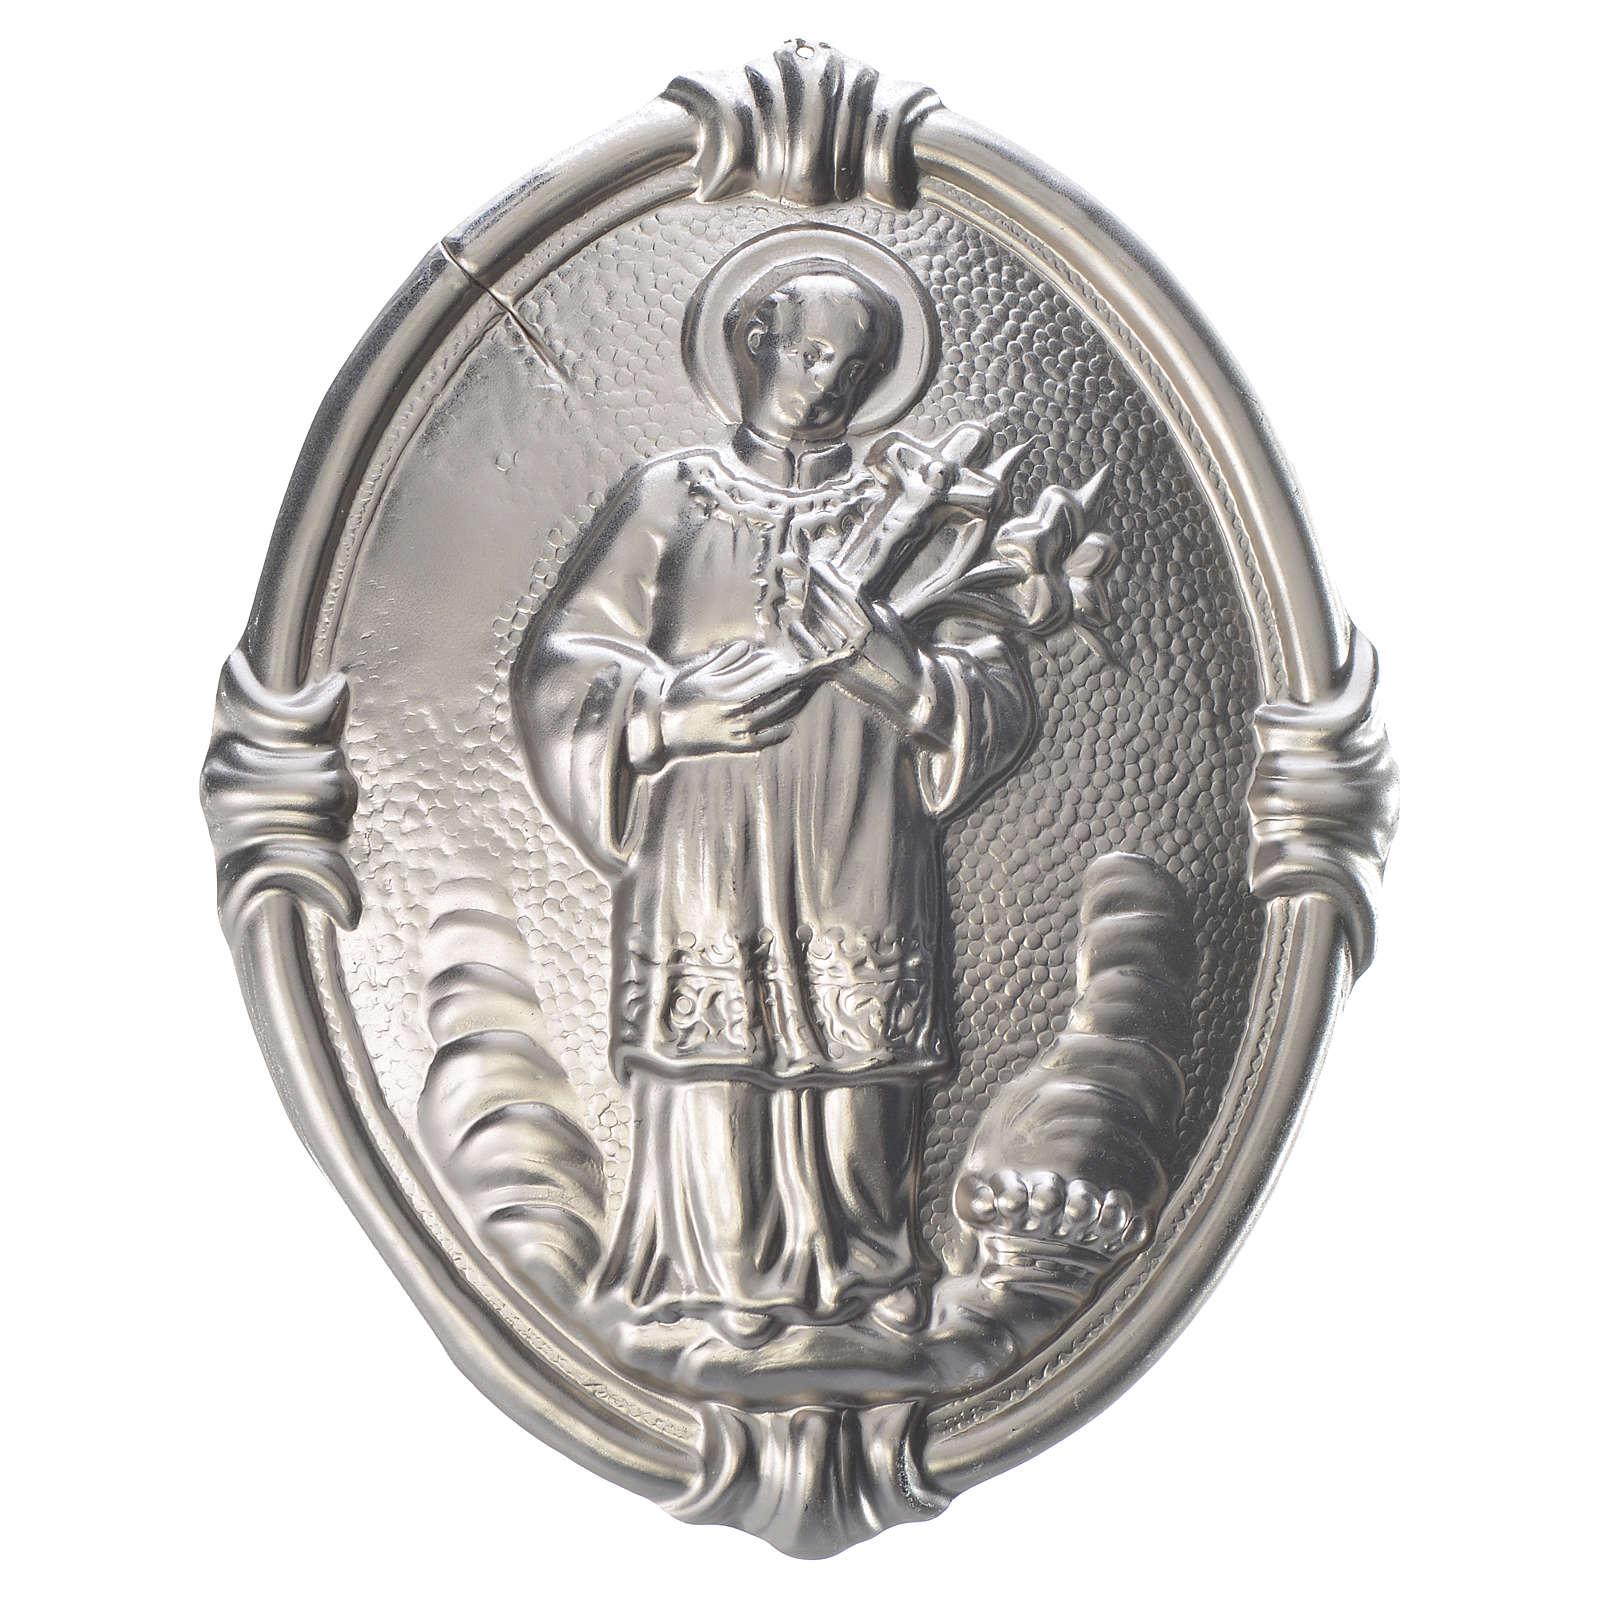 Confraternity Medal in brass, St. Luigi 3